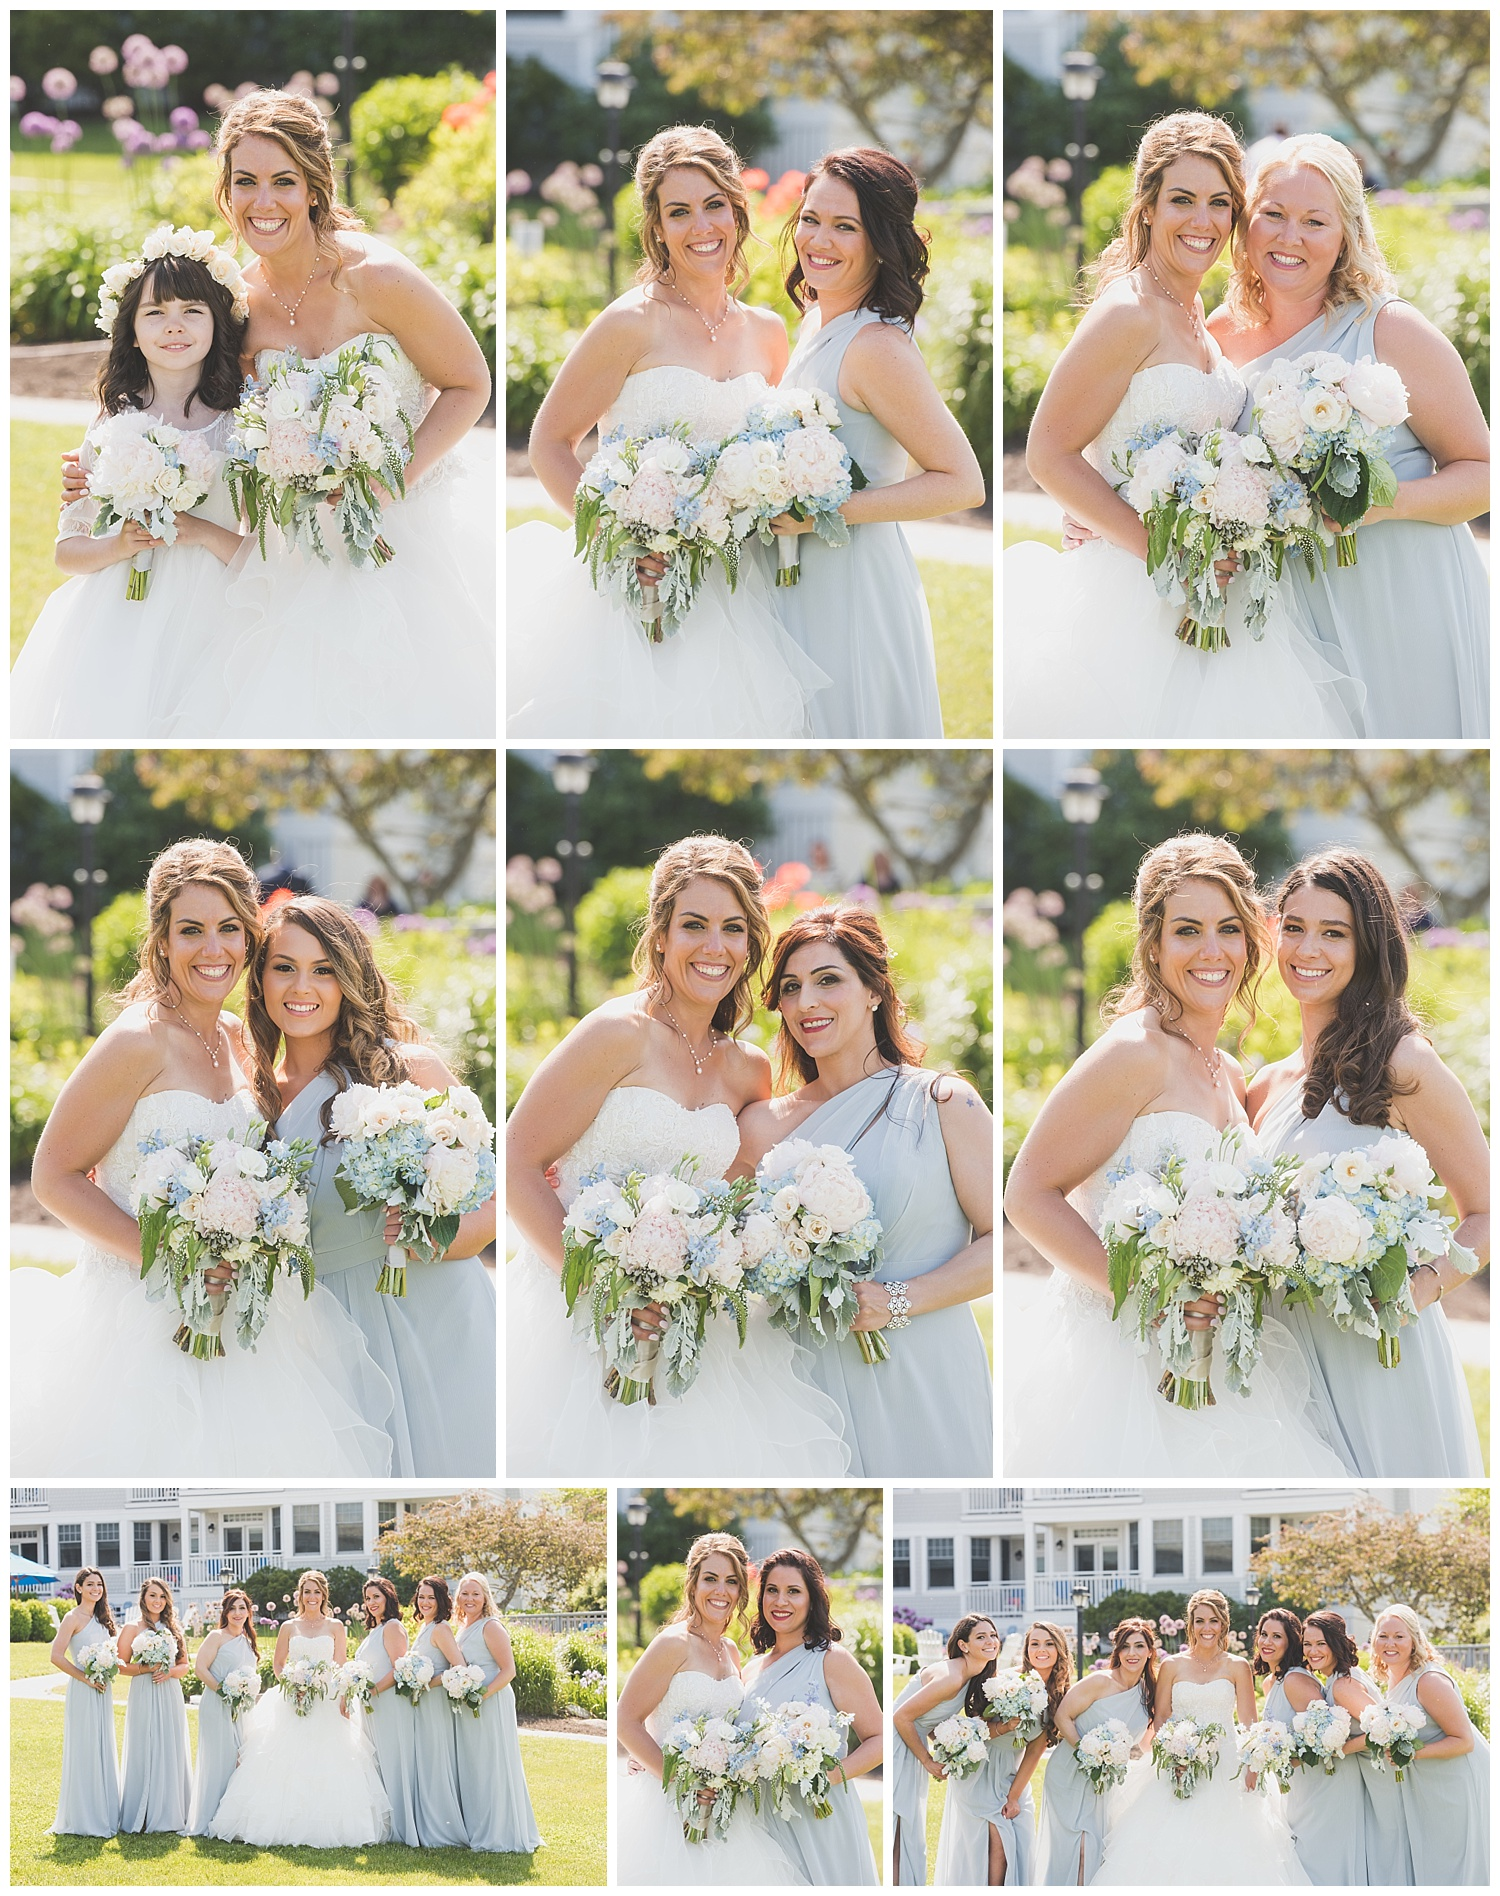 Beachmere Inn Wedding Photography_0046.jpg